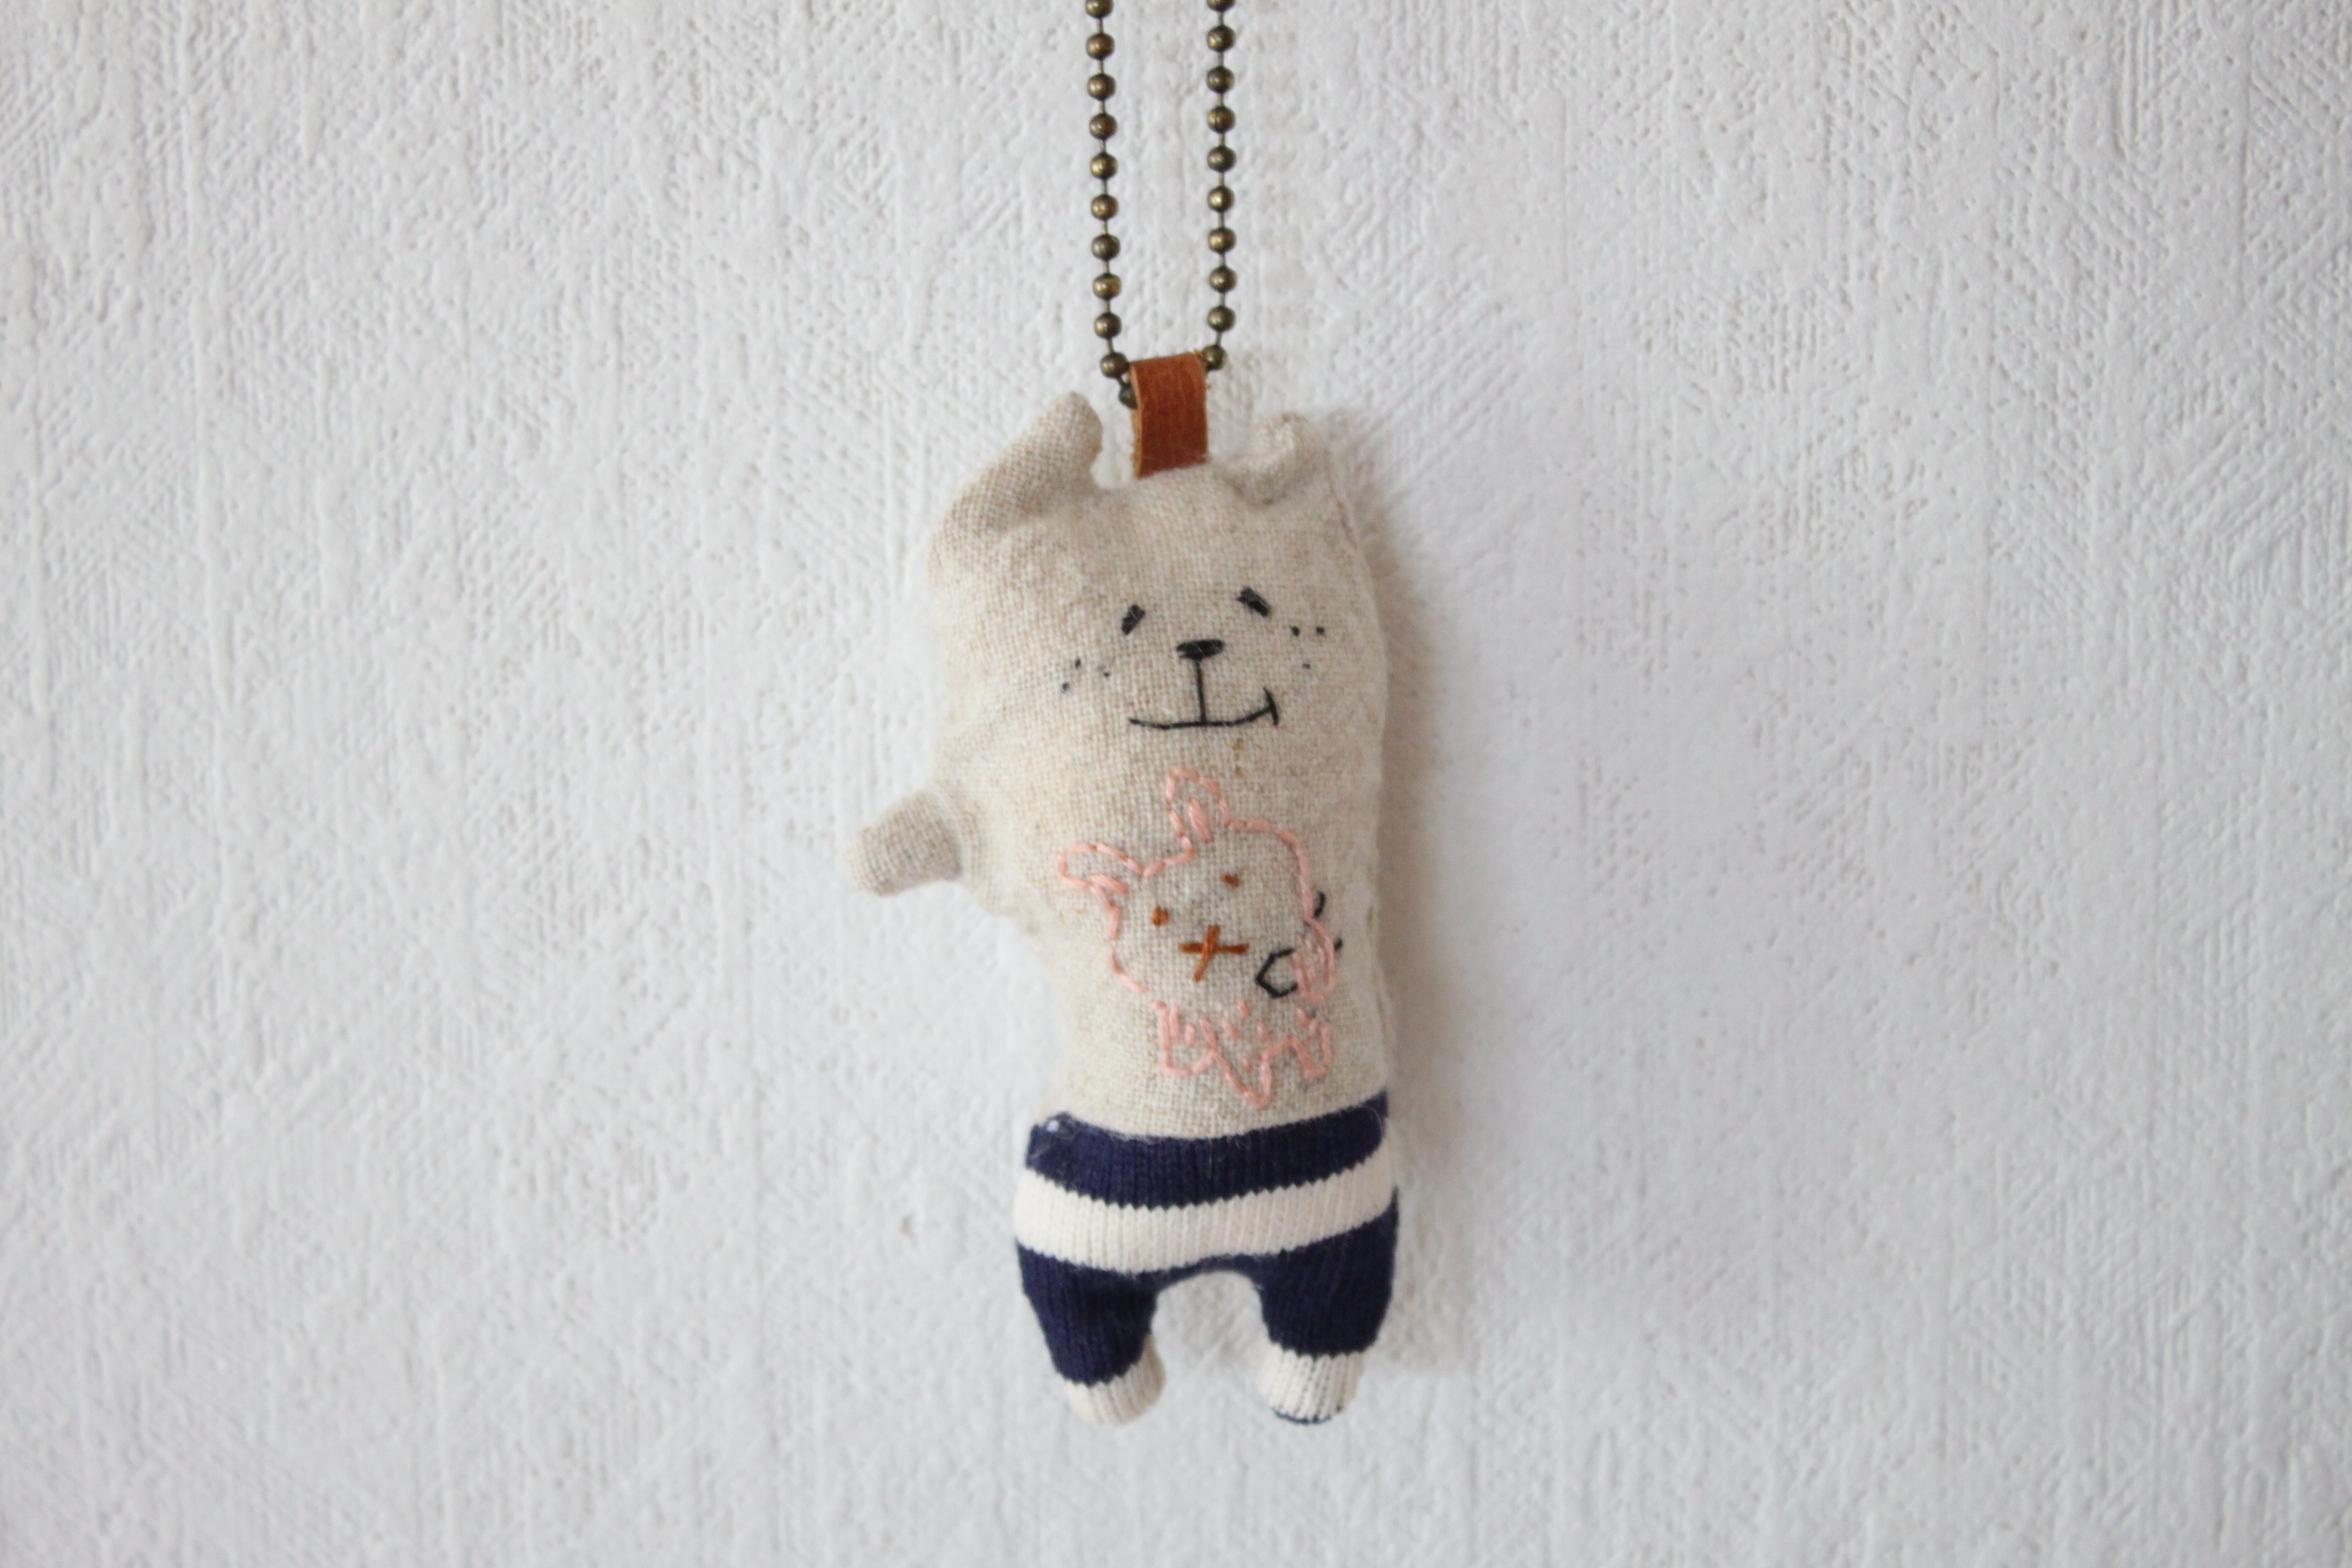 muuちゃん 手刺繍 ウサギさん ストラップ